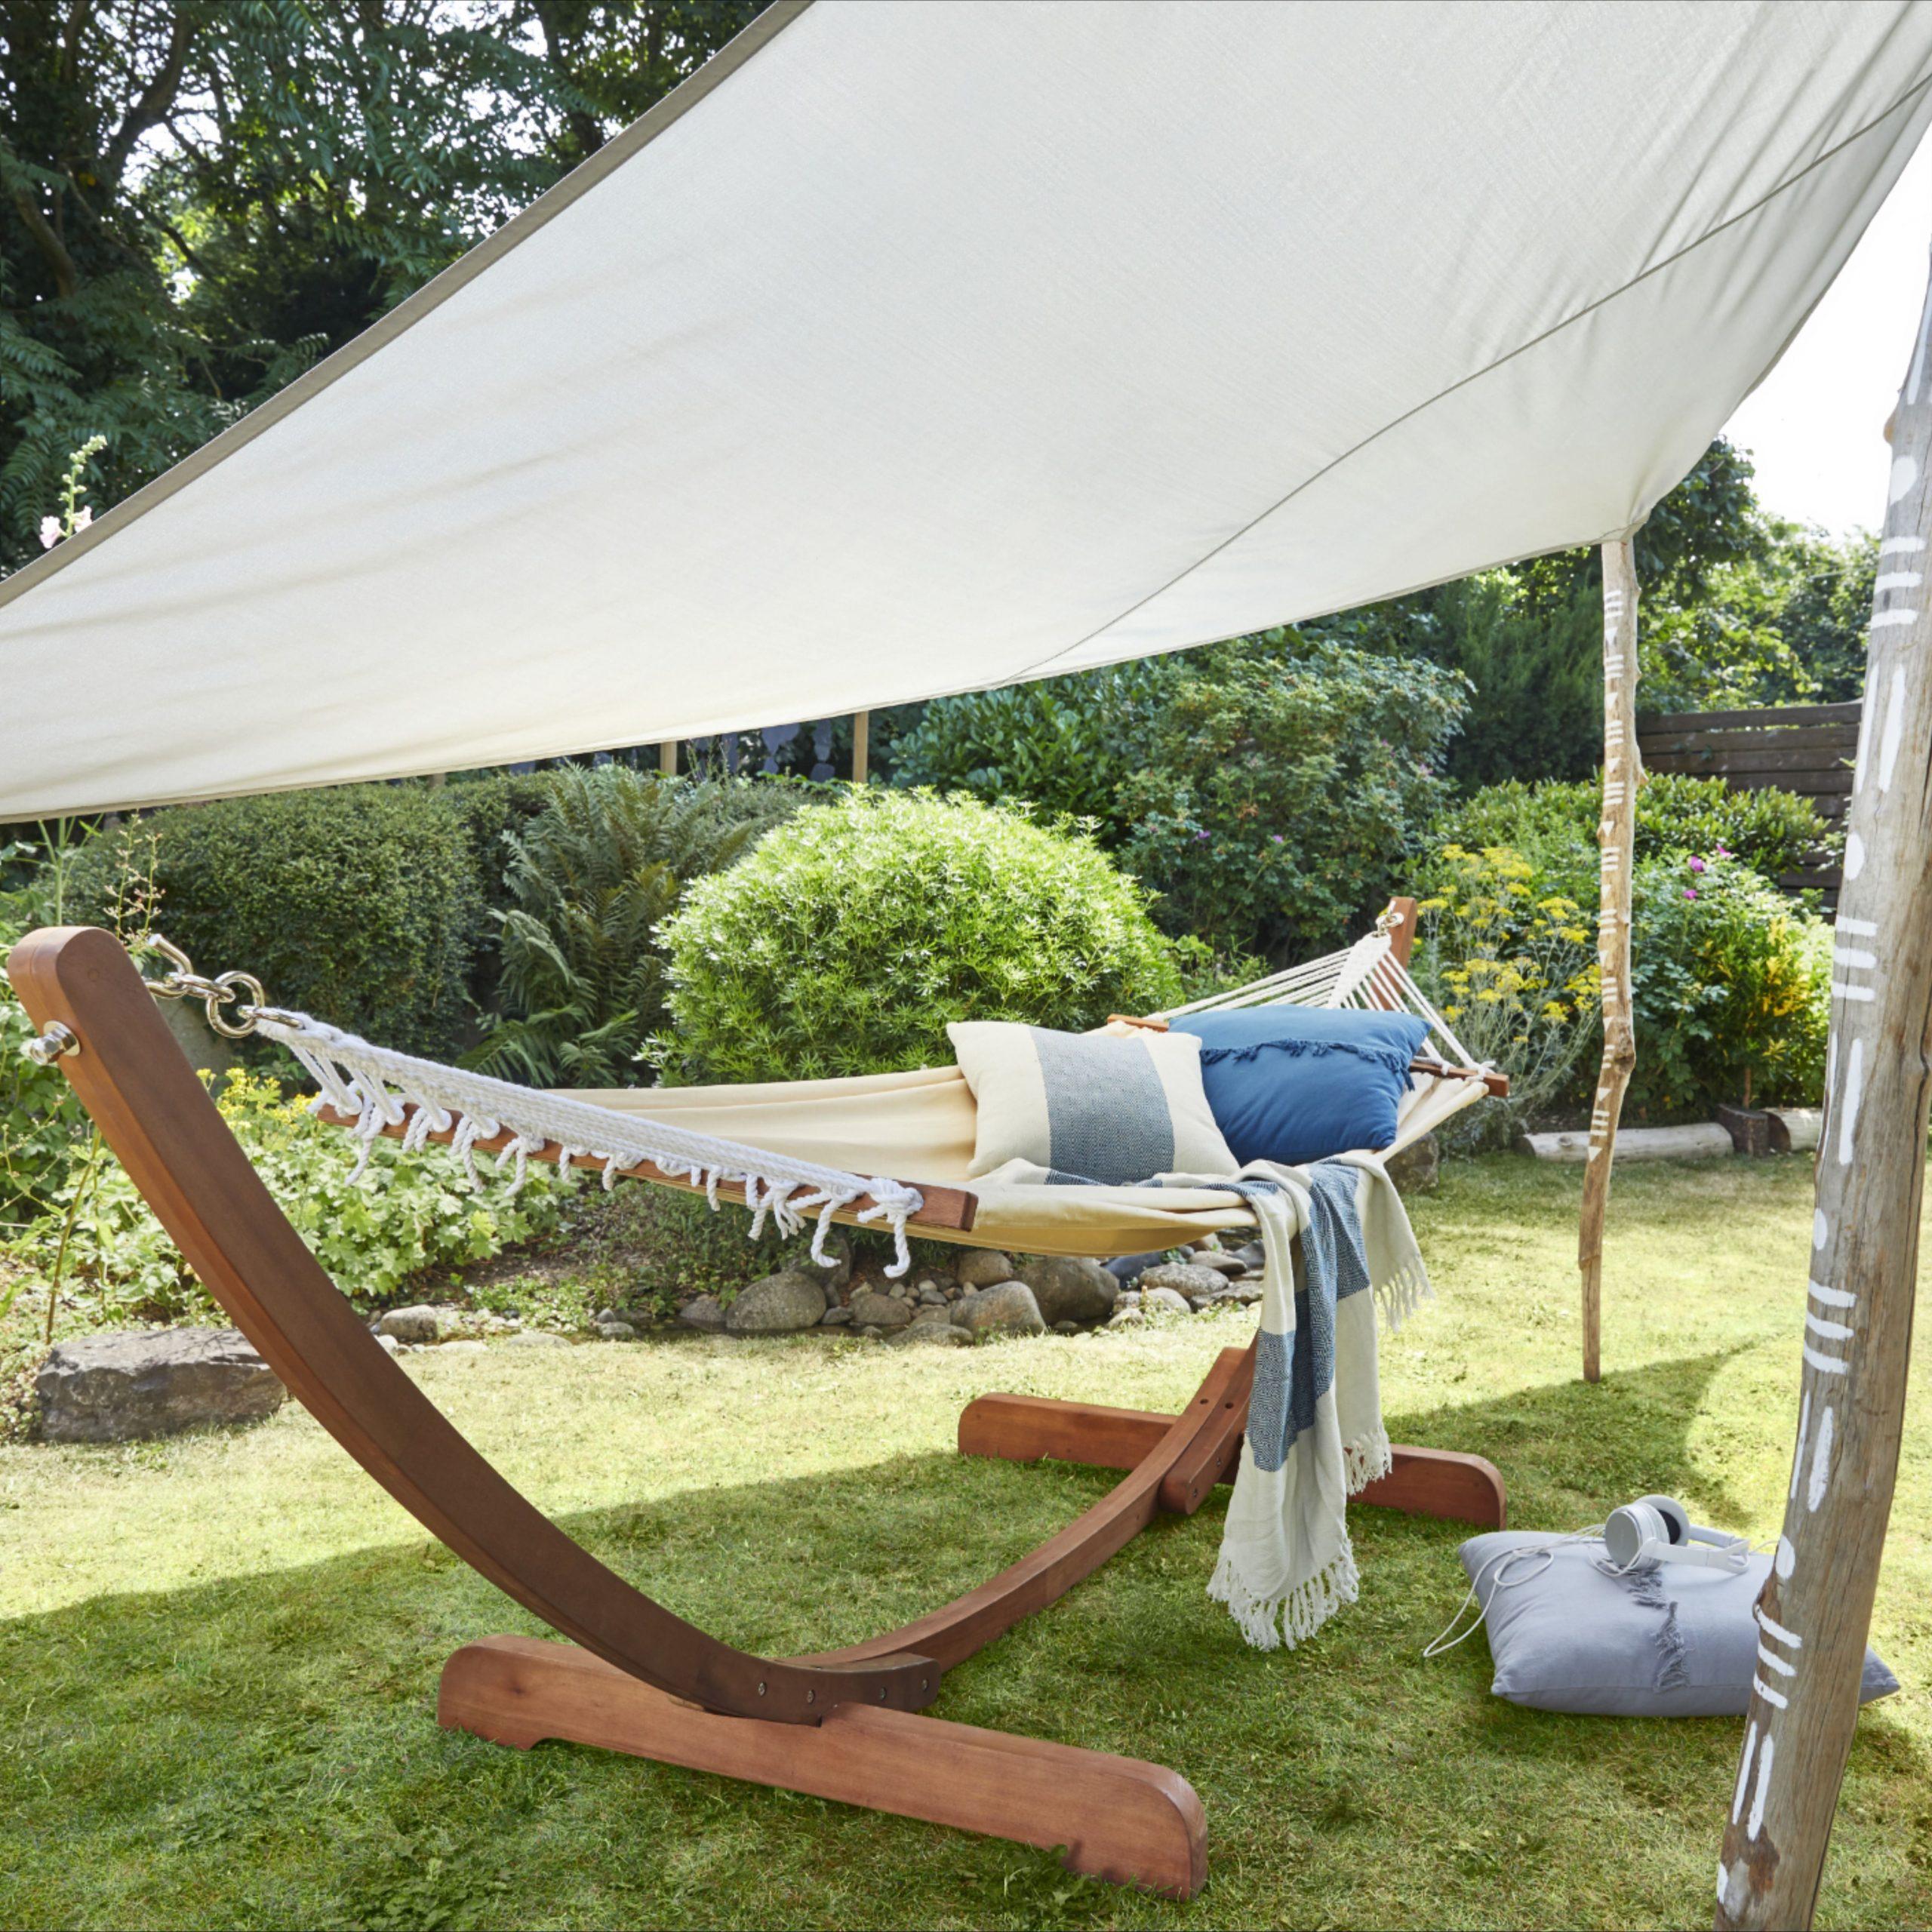 Hamac Et Support Bois Blooma Lopevi Macadamia | Mobilier ... intérieur Balancelle De Jardin Castorama